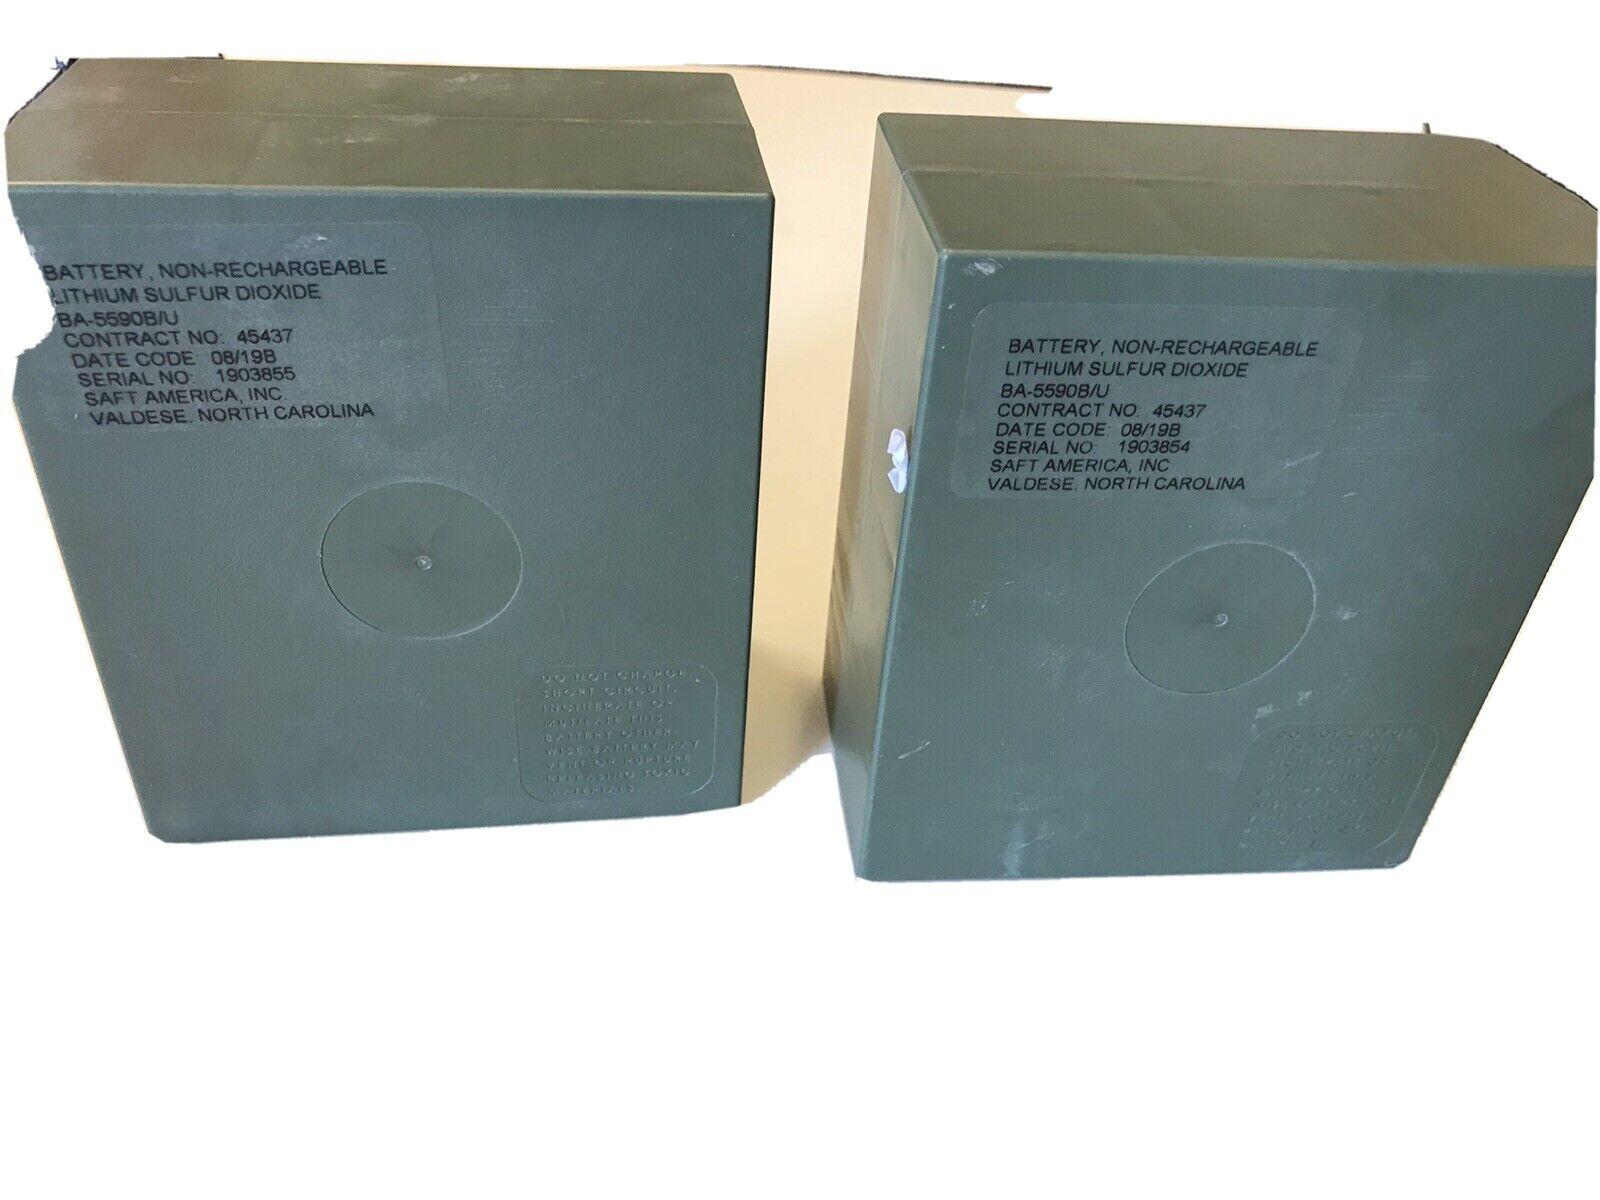 Saft Ba-5590/U Battery (12V/24V), Lithium, Military, Sealed, Radio, NOS US A